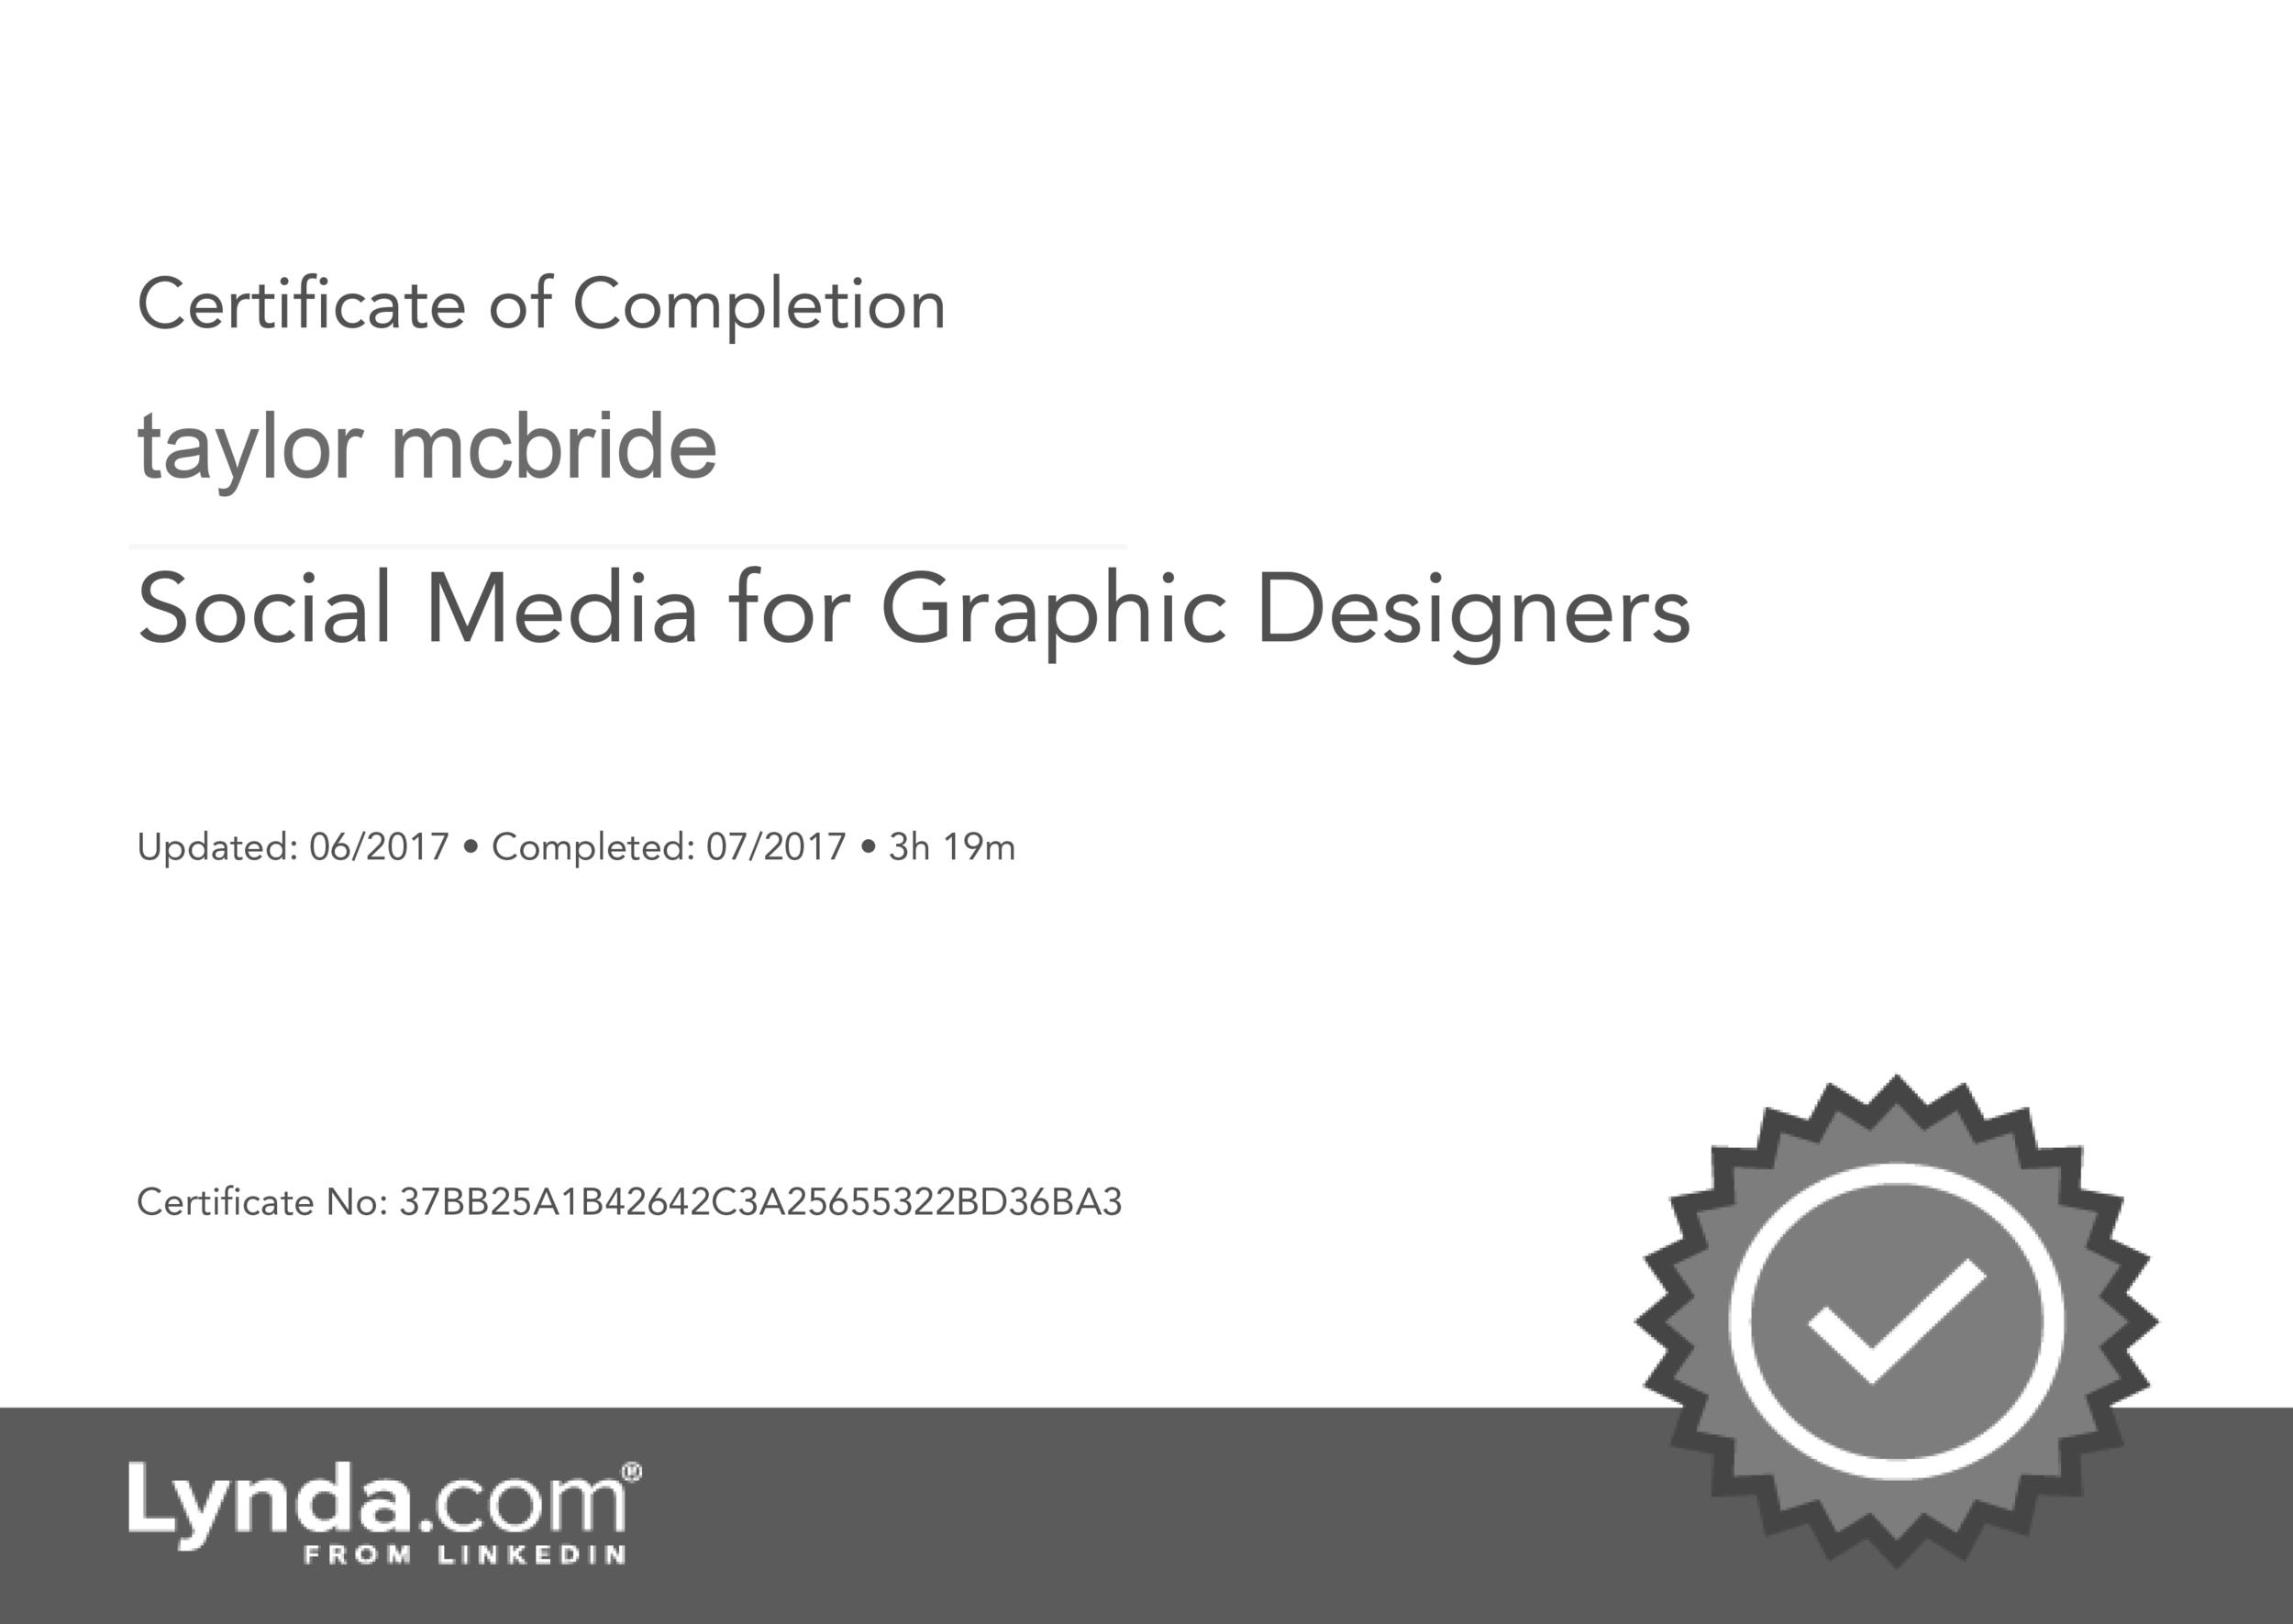 Social-Media-Graphic-Design-Certificate